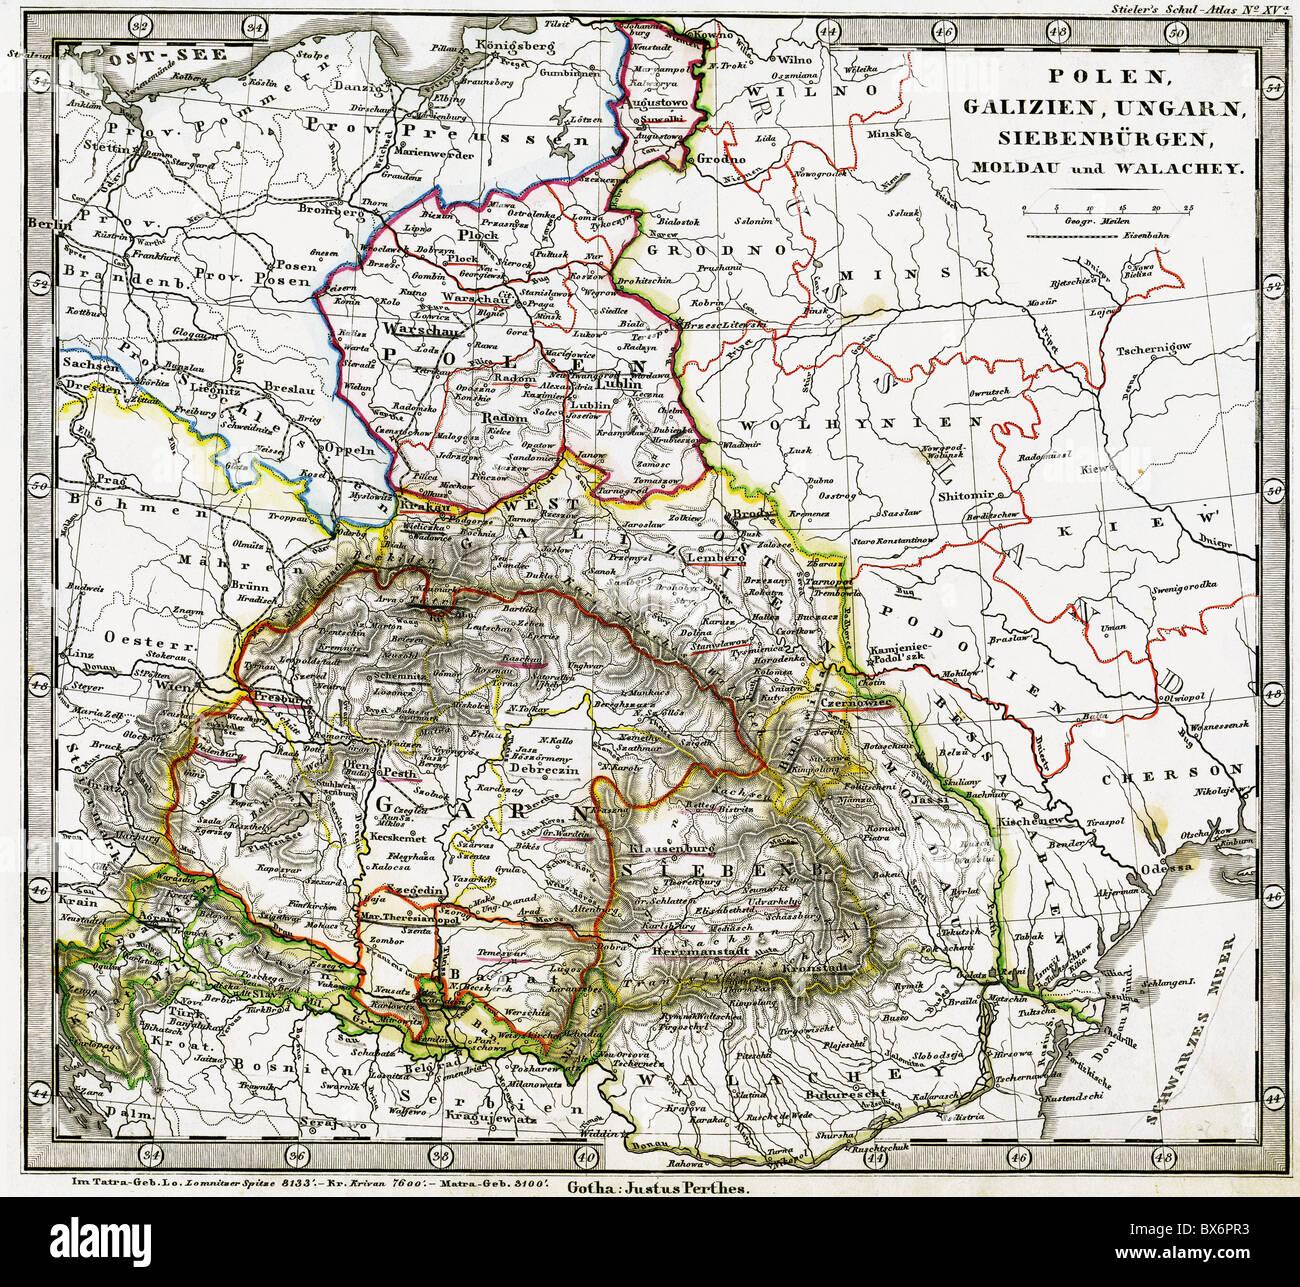 Cartography Maps Central Europe Poland Hungary Galicia Stock